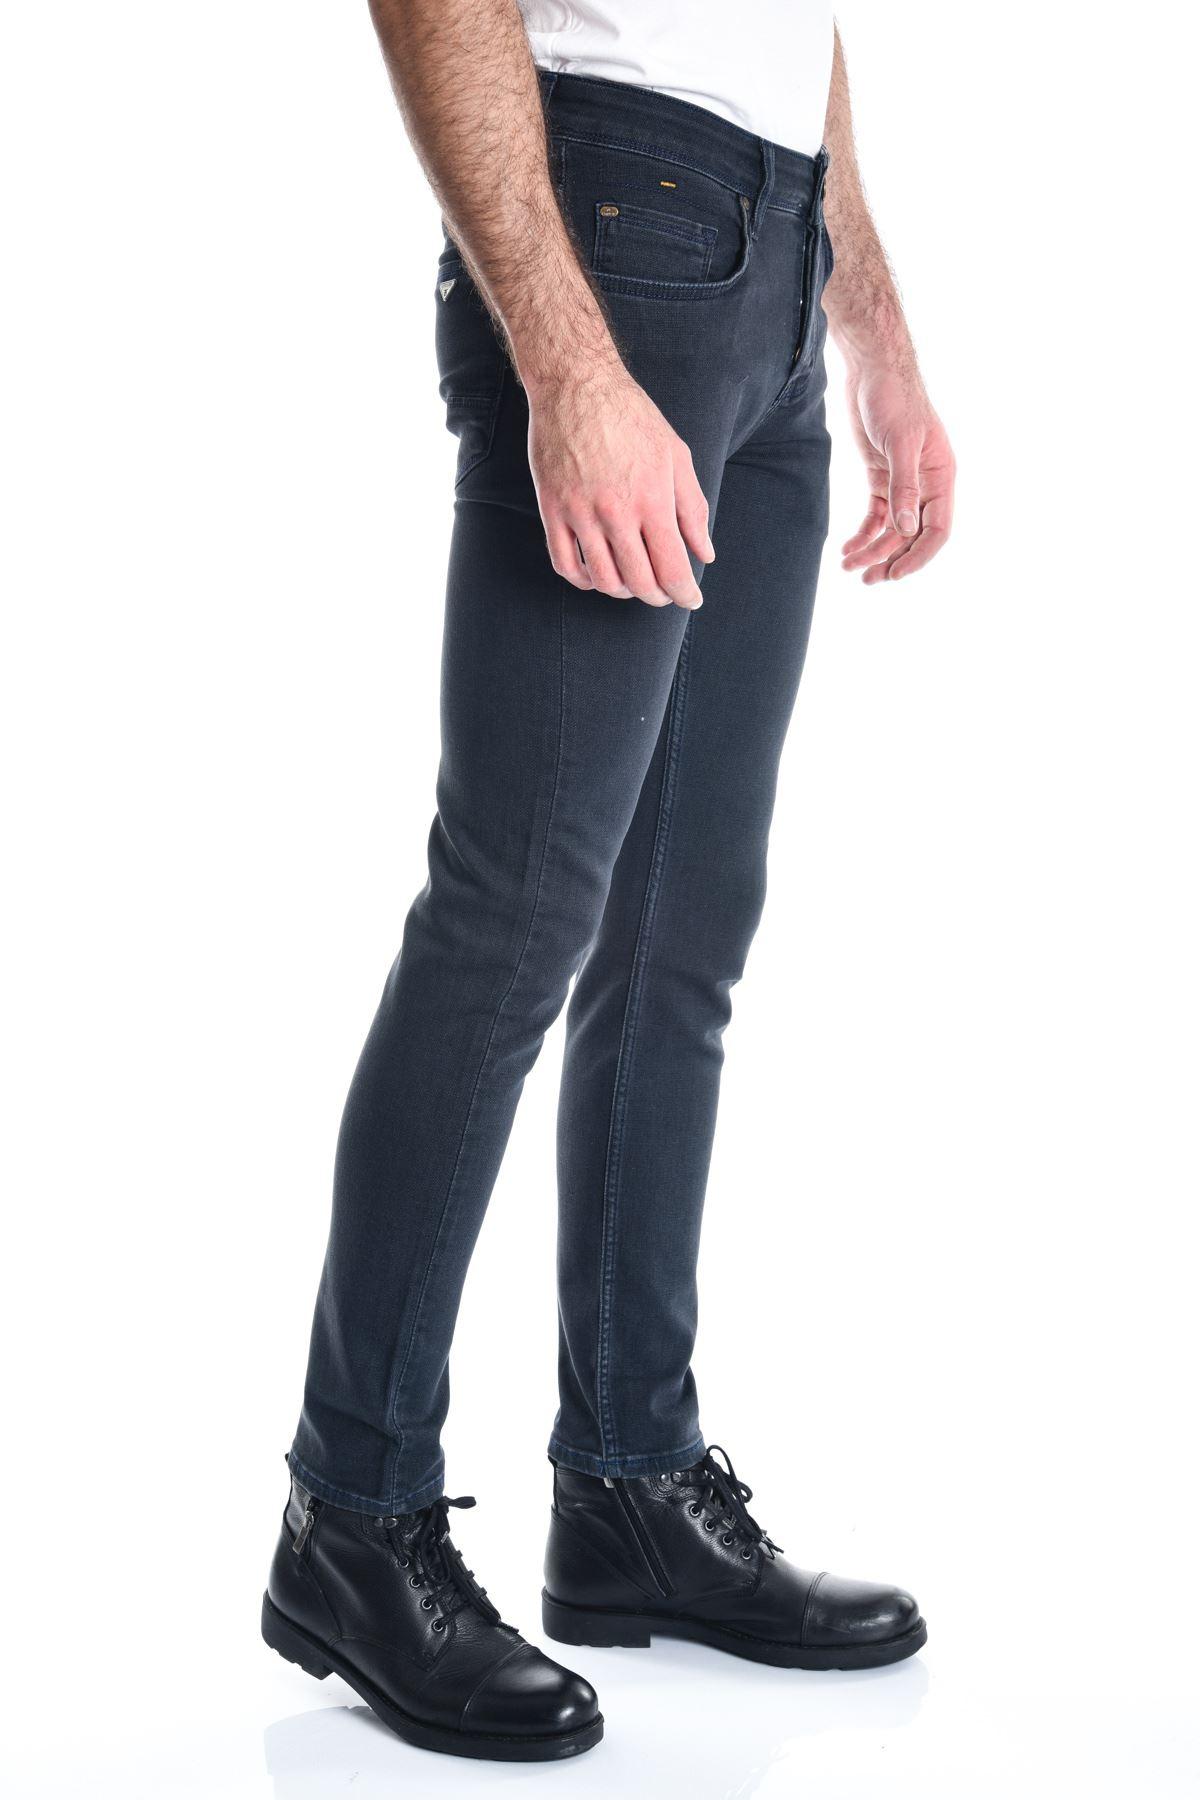 Örme Kumaş Petrol Erkek Kot Pantolon